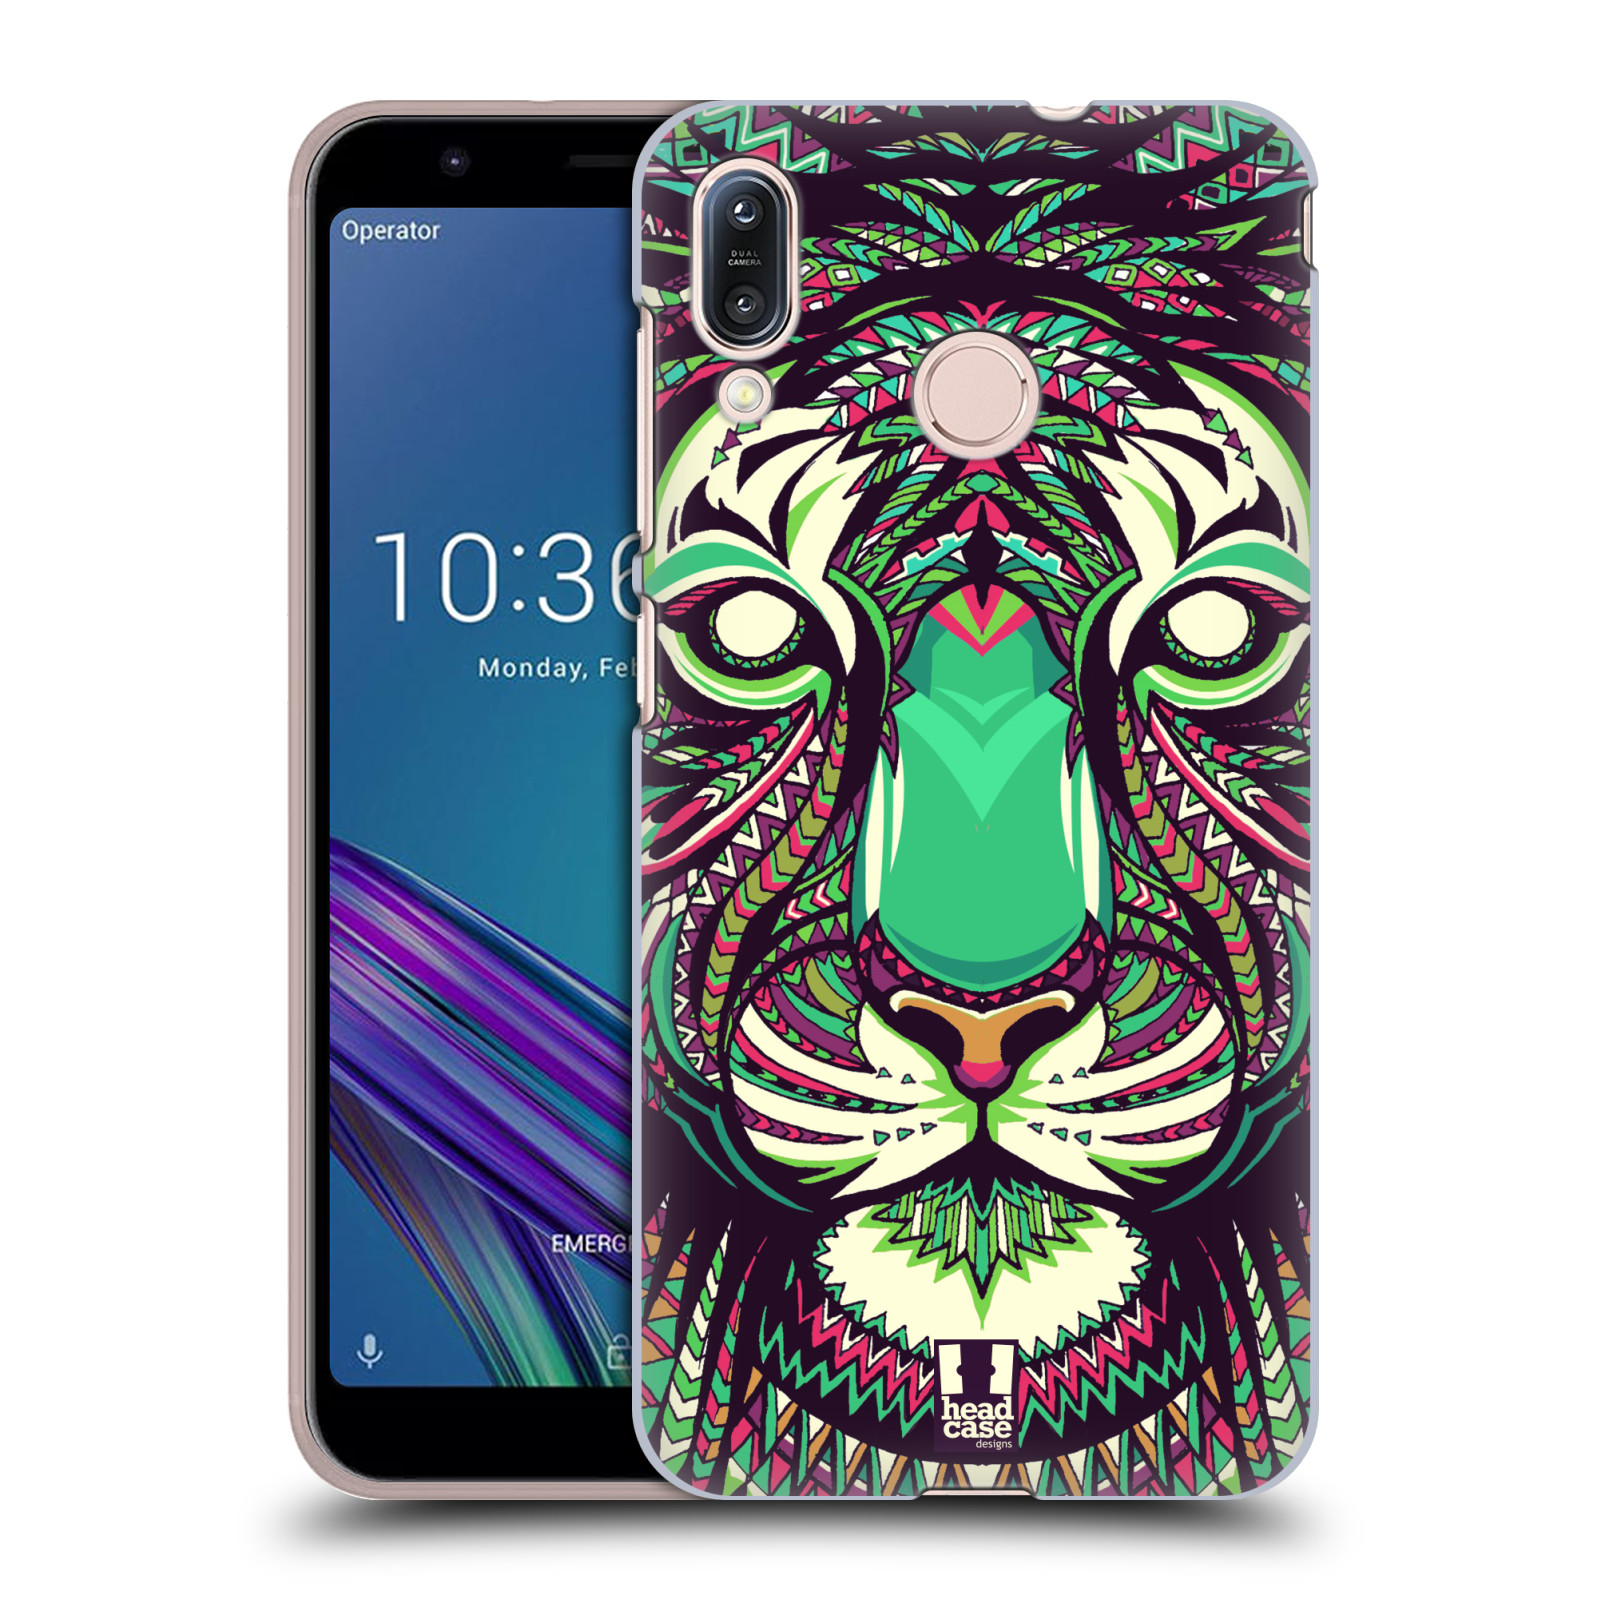 Pouzdro na mobil Asus Zenfone Max M1 (ZB555KL) - HEAD CASE - vzor Aztécký motiv zvíře 2 tygr